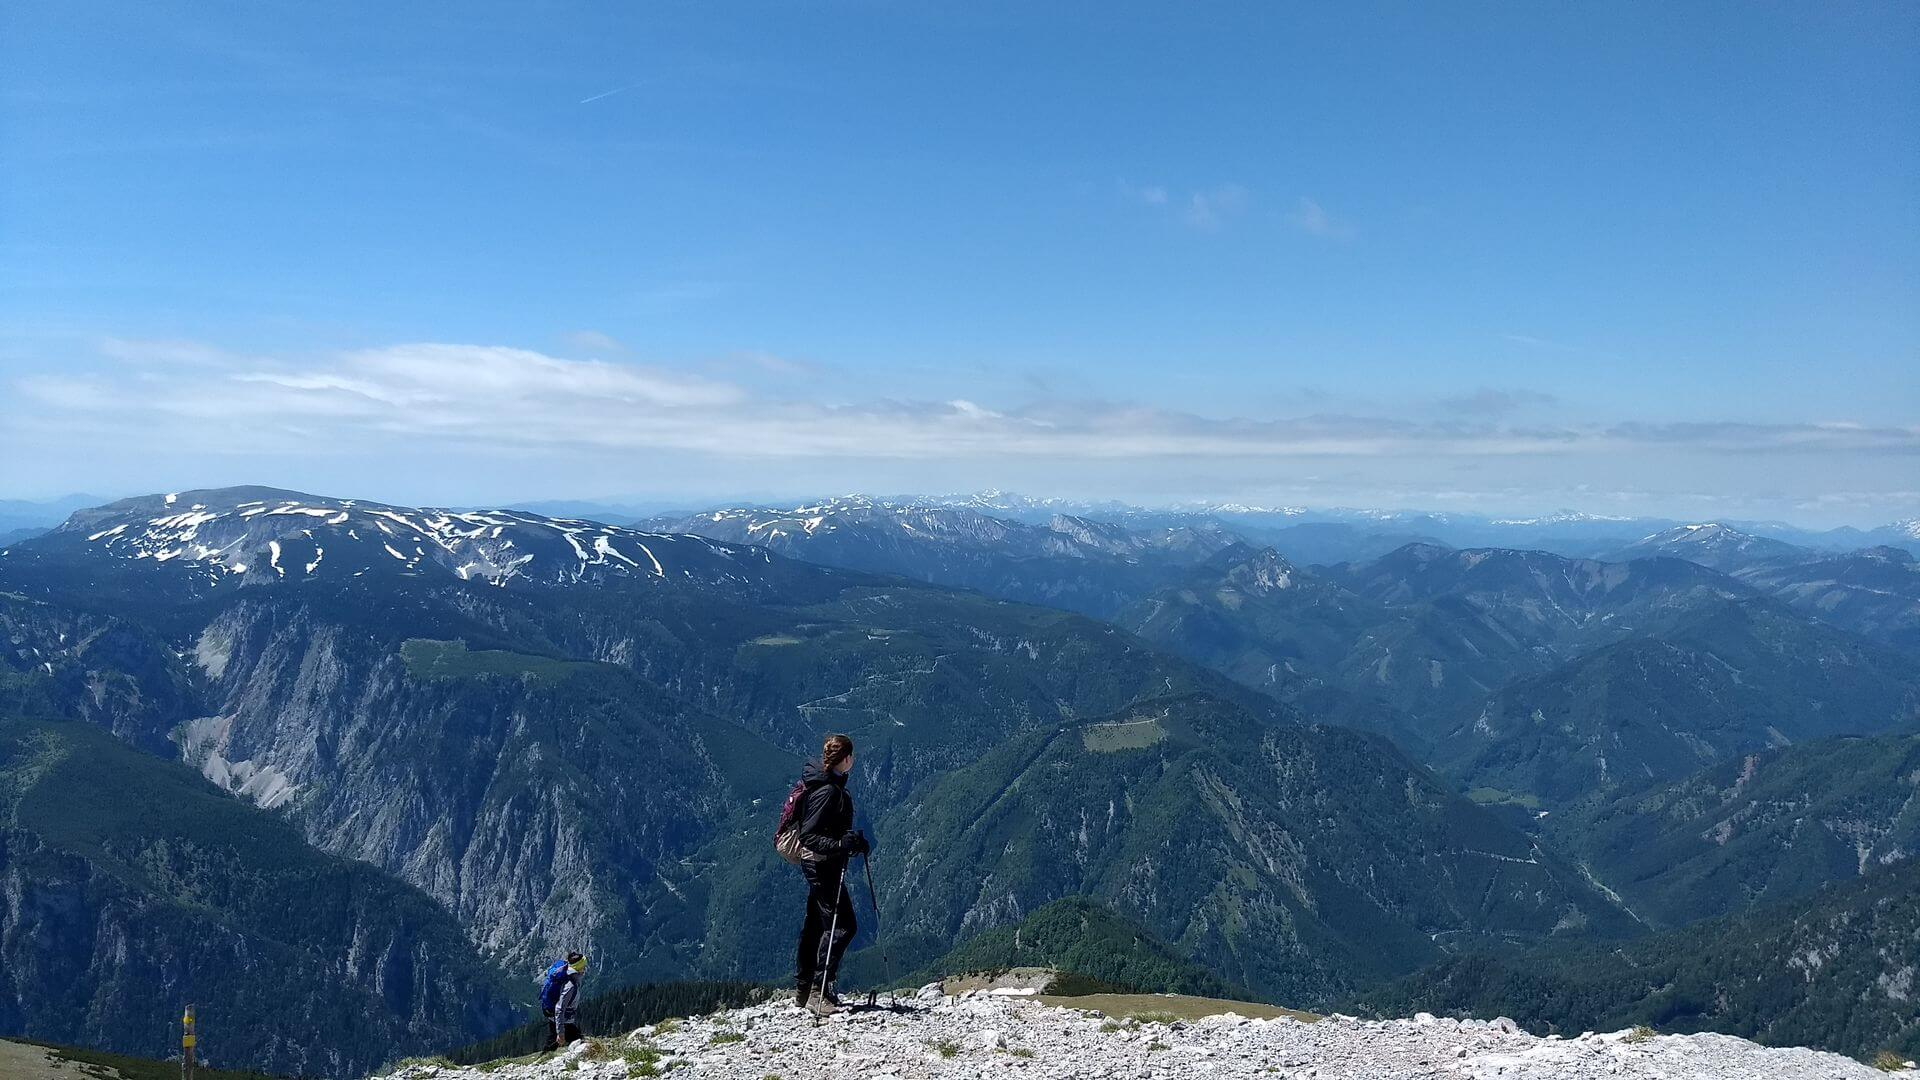 bergsteigen-schneeberg-17-fadensteig